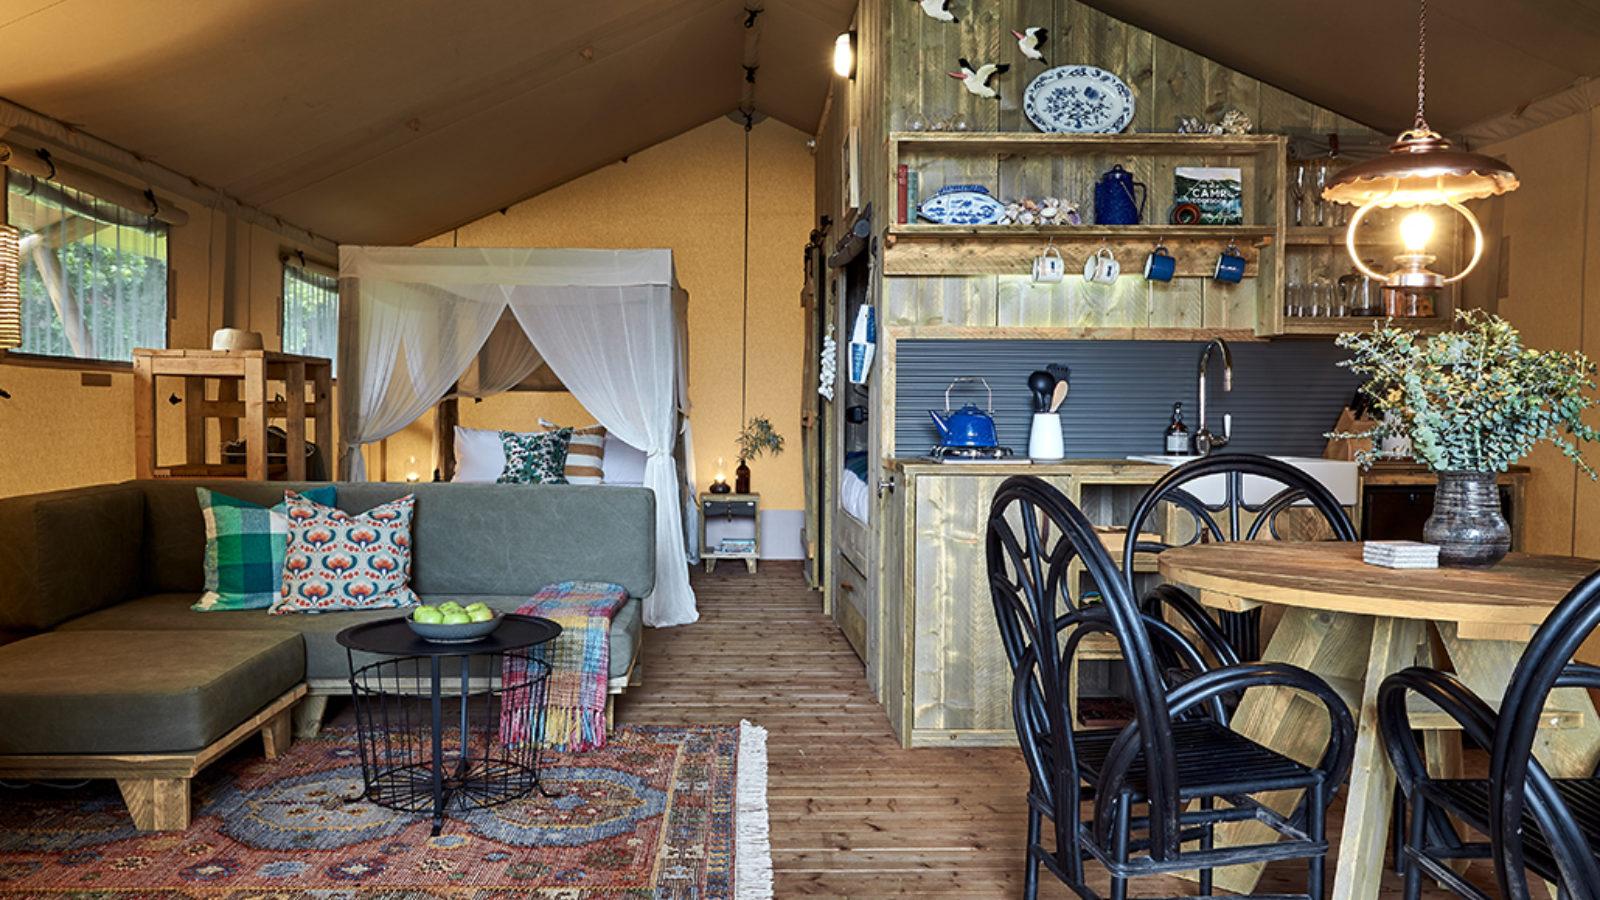 Myall River Camp glamping interior